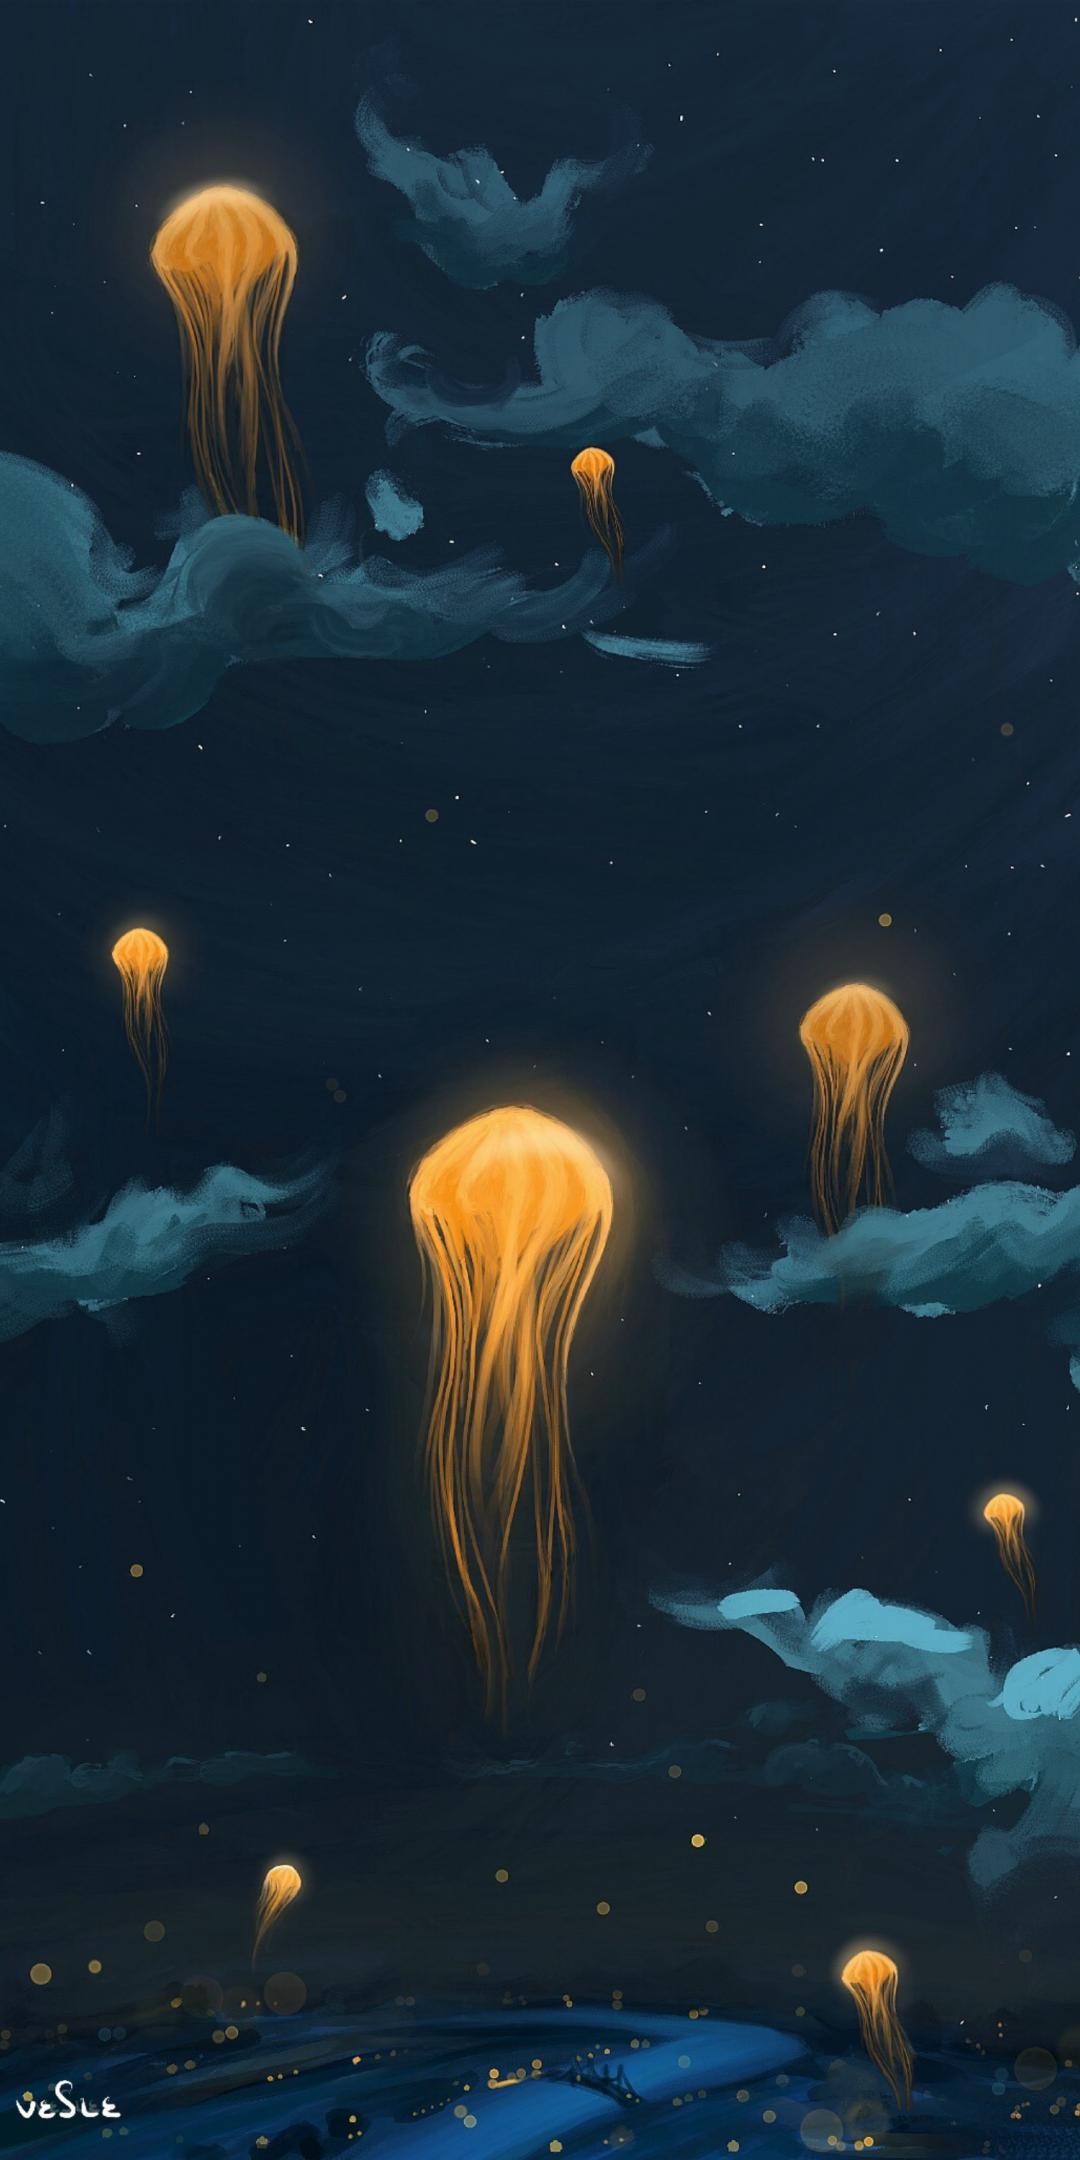 Jellyfish, lanterns, flight, clouds, night, 1080x2160 wallpaper